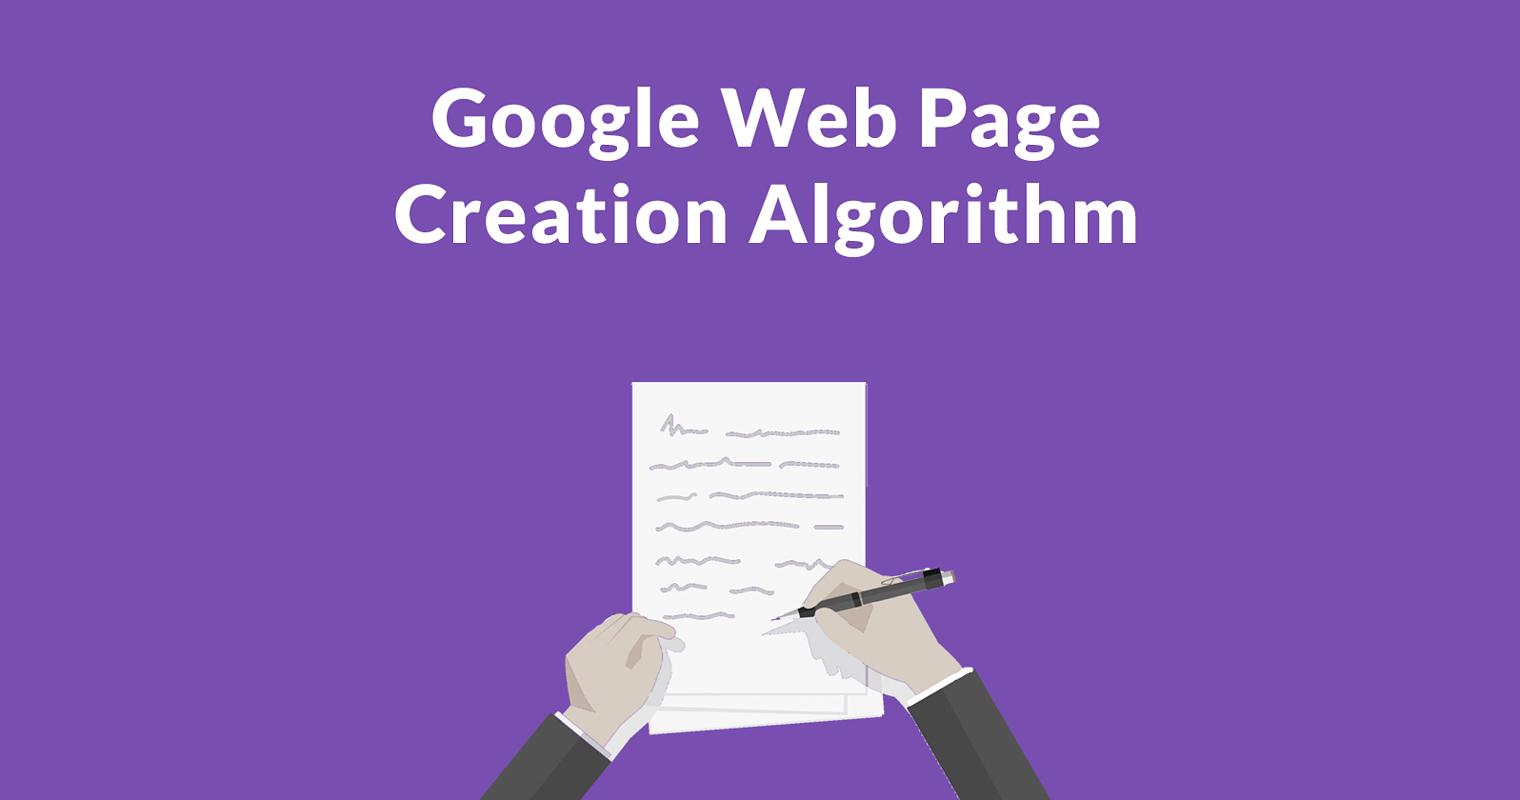 Google's New Algorithm Creates Original Articles From Your Content